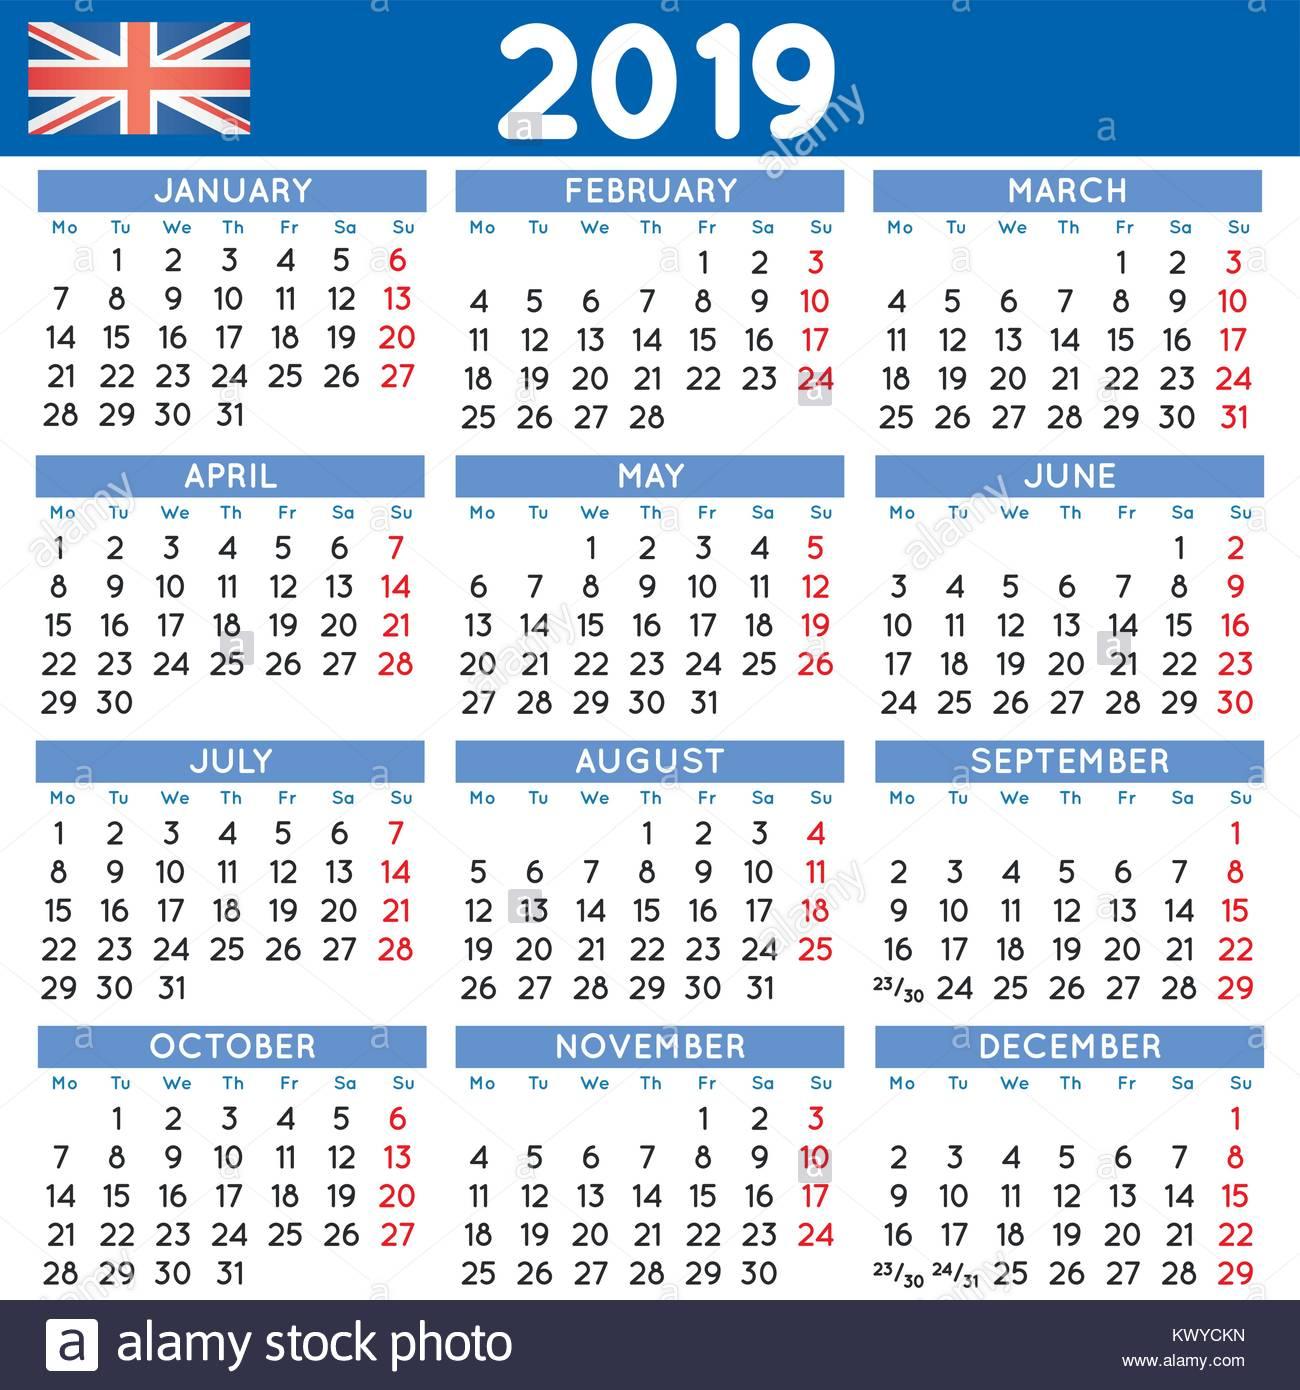 Calendario 2019 English.2019 Elegant Squared Calendar English Uk Year 2019 Calendar